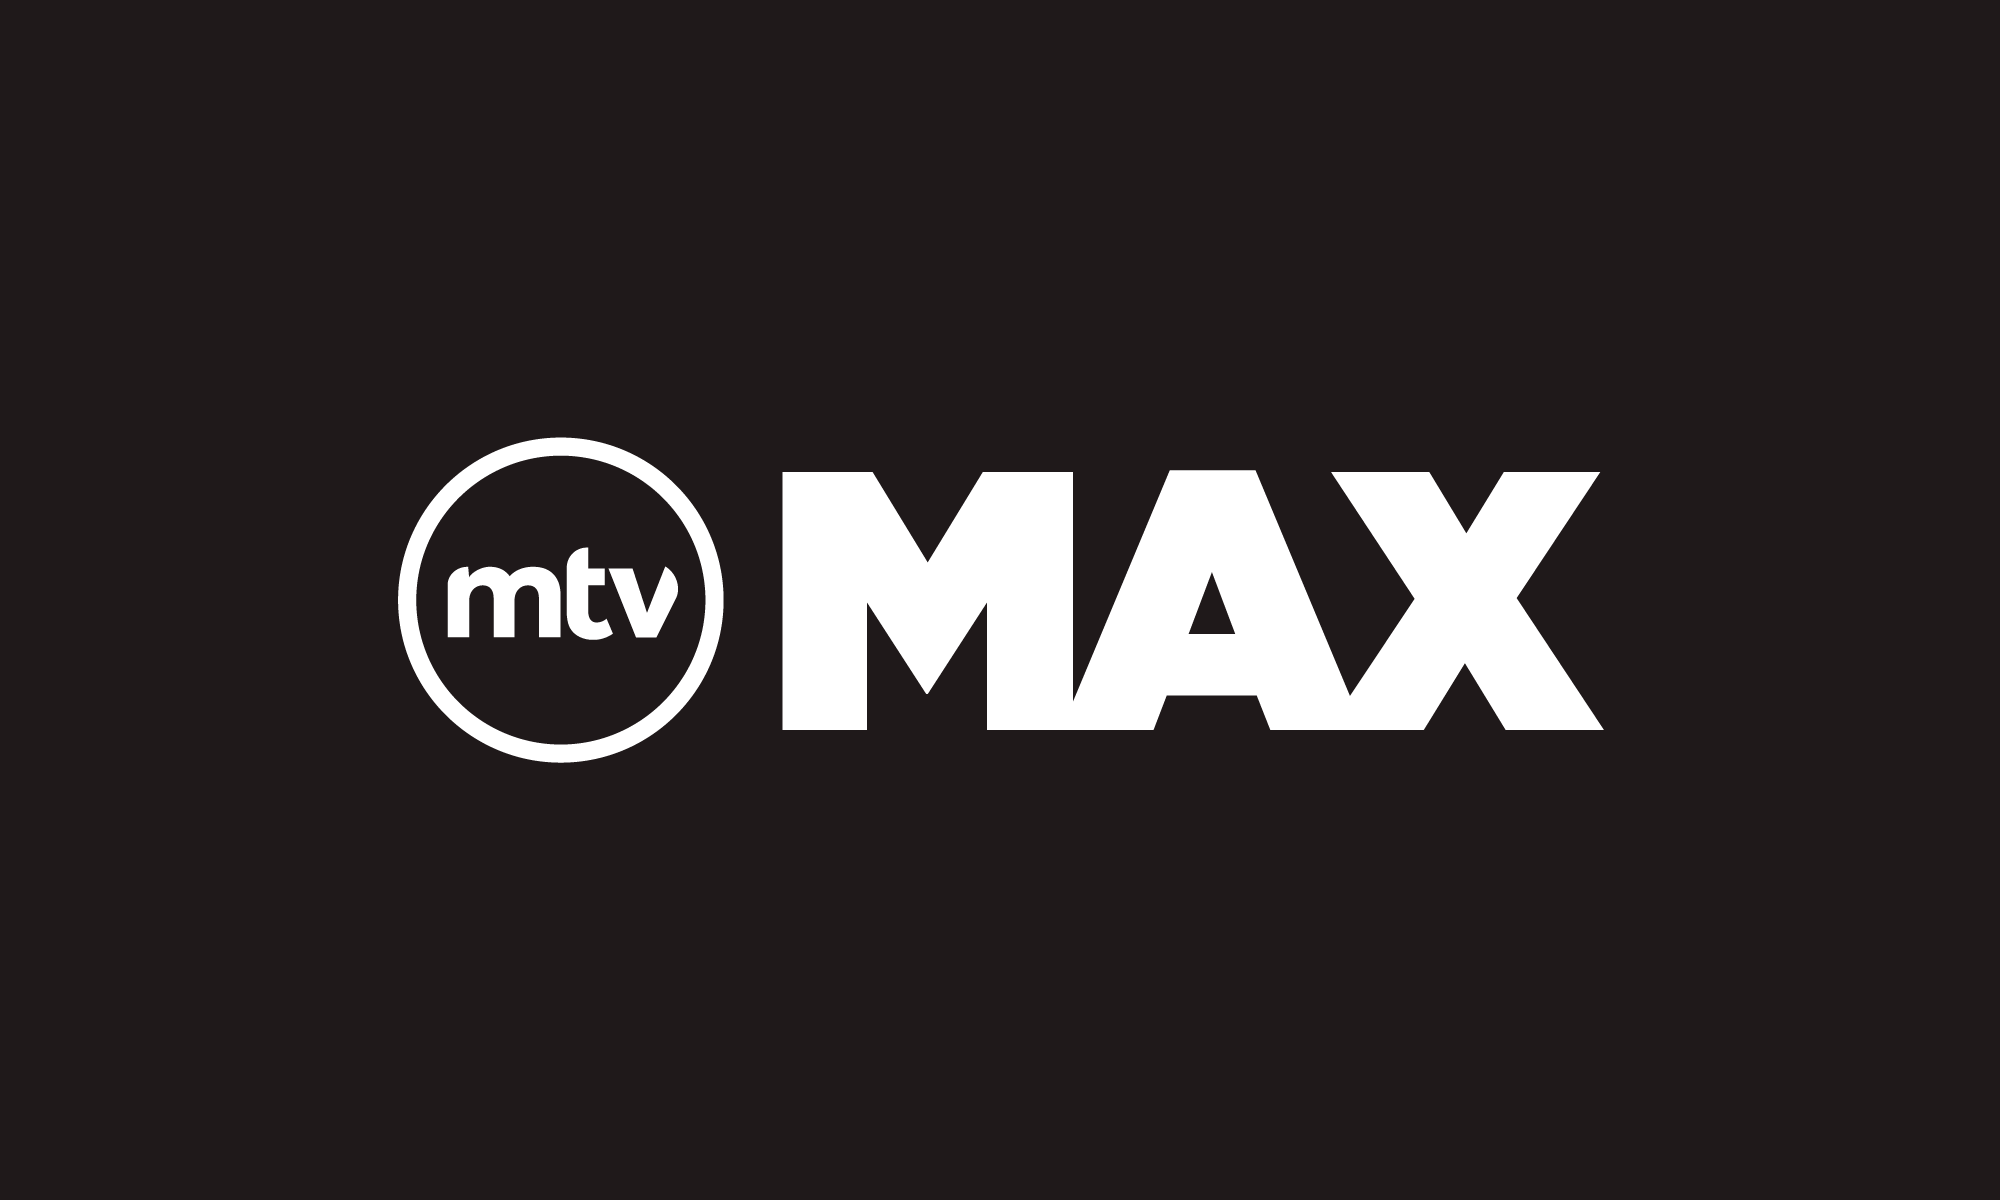 mtv_logo_max